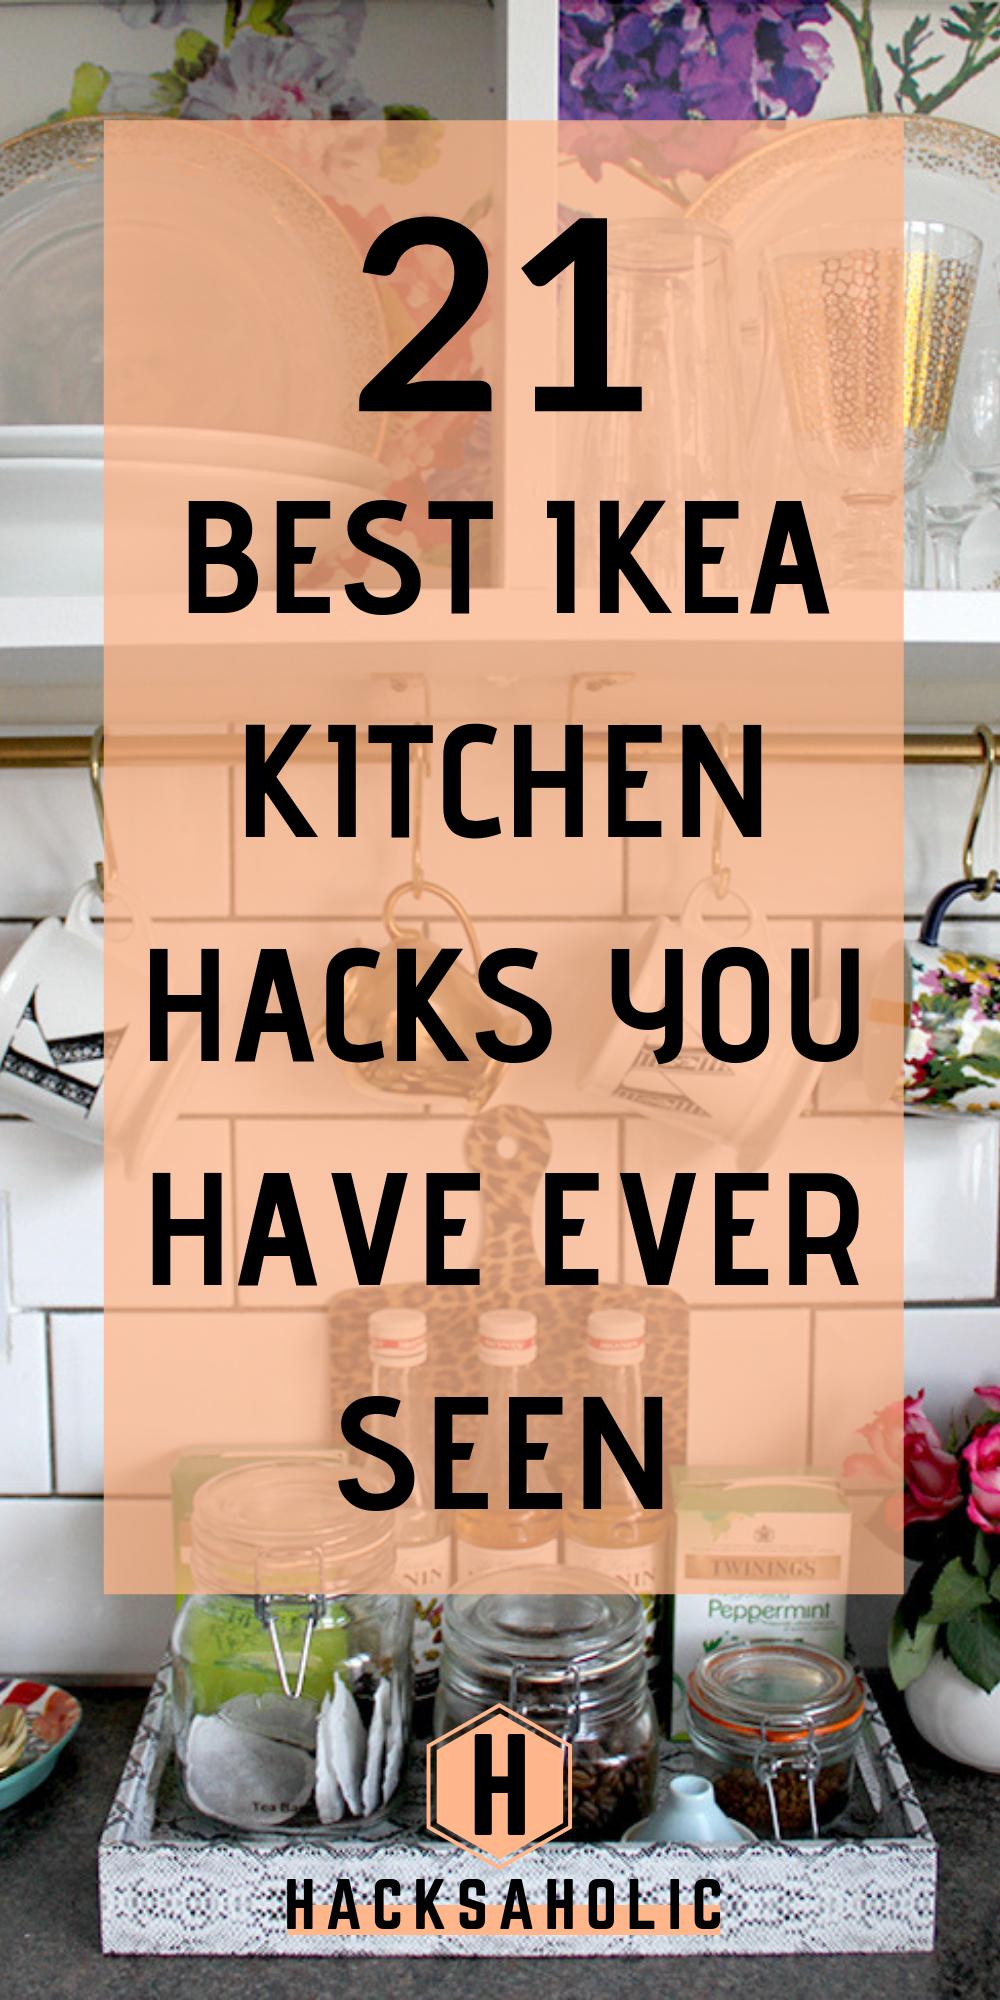 21 Ikea Kitchen Hacks That Will Keep You Organized